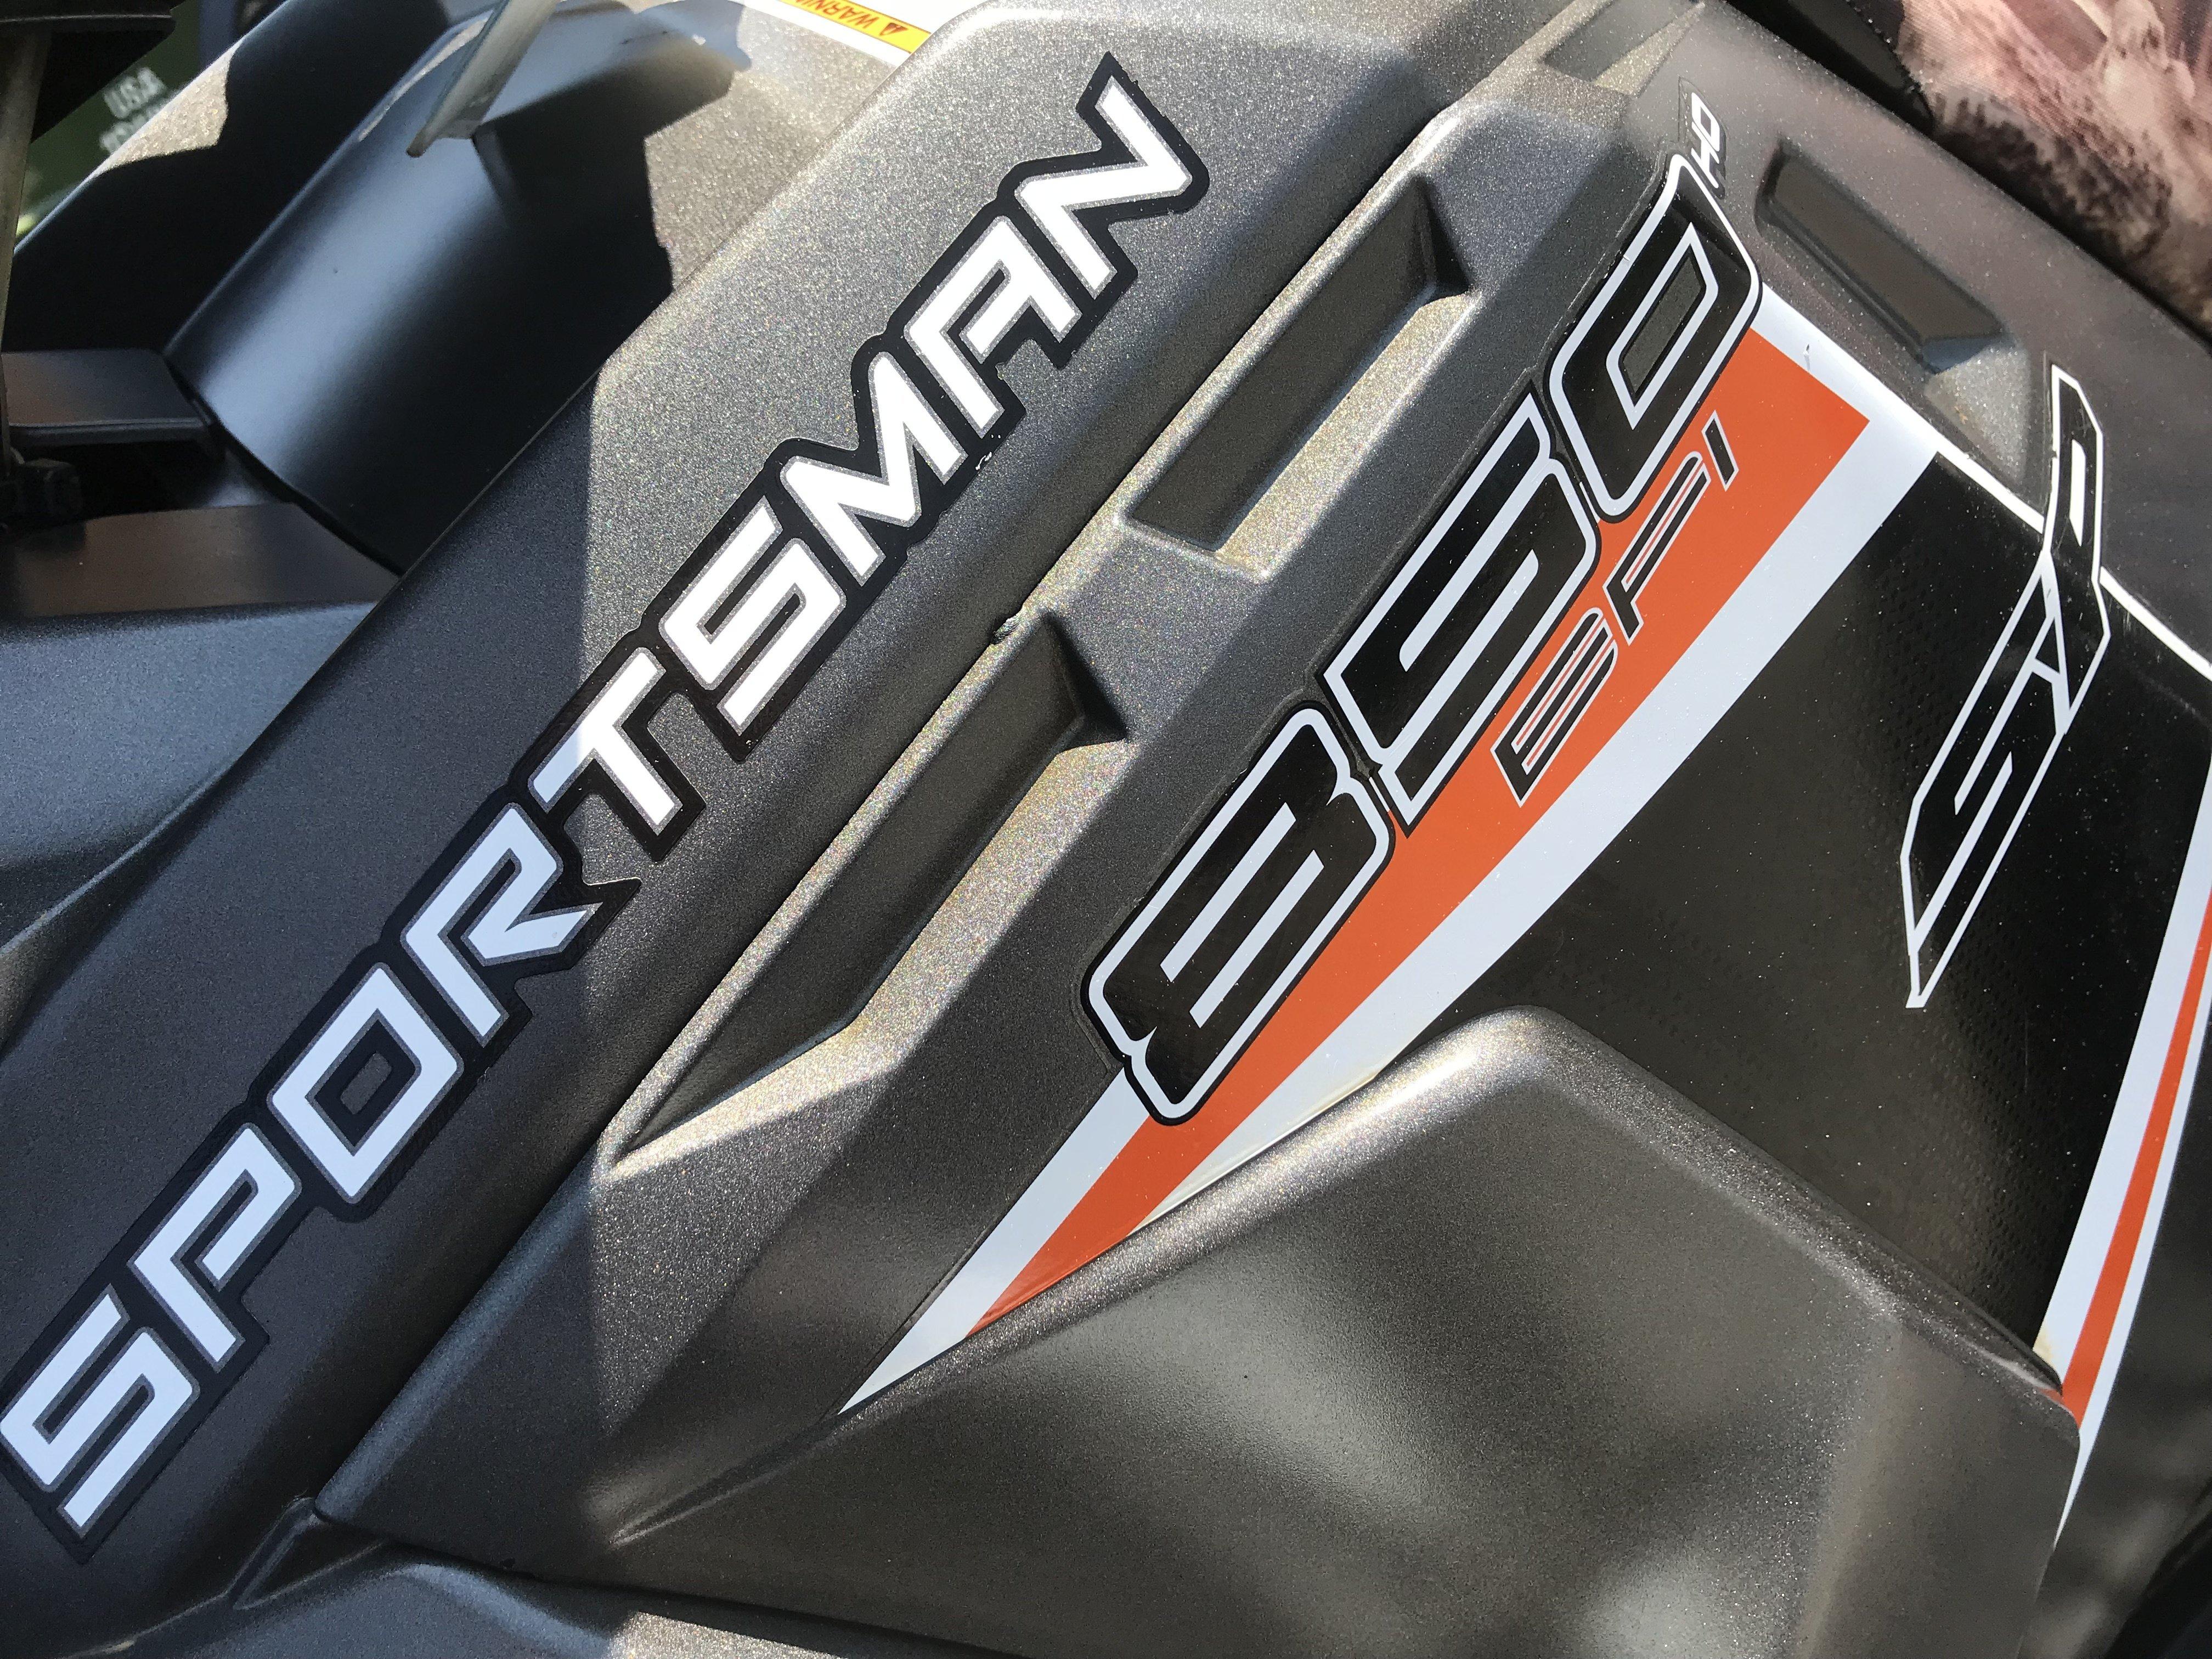 2015 Polaris Sportsman 850 SP Highlifter Kit - Low Miles!